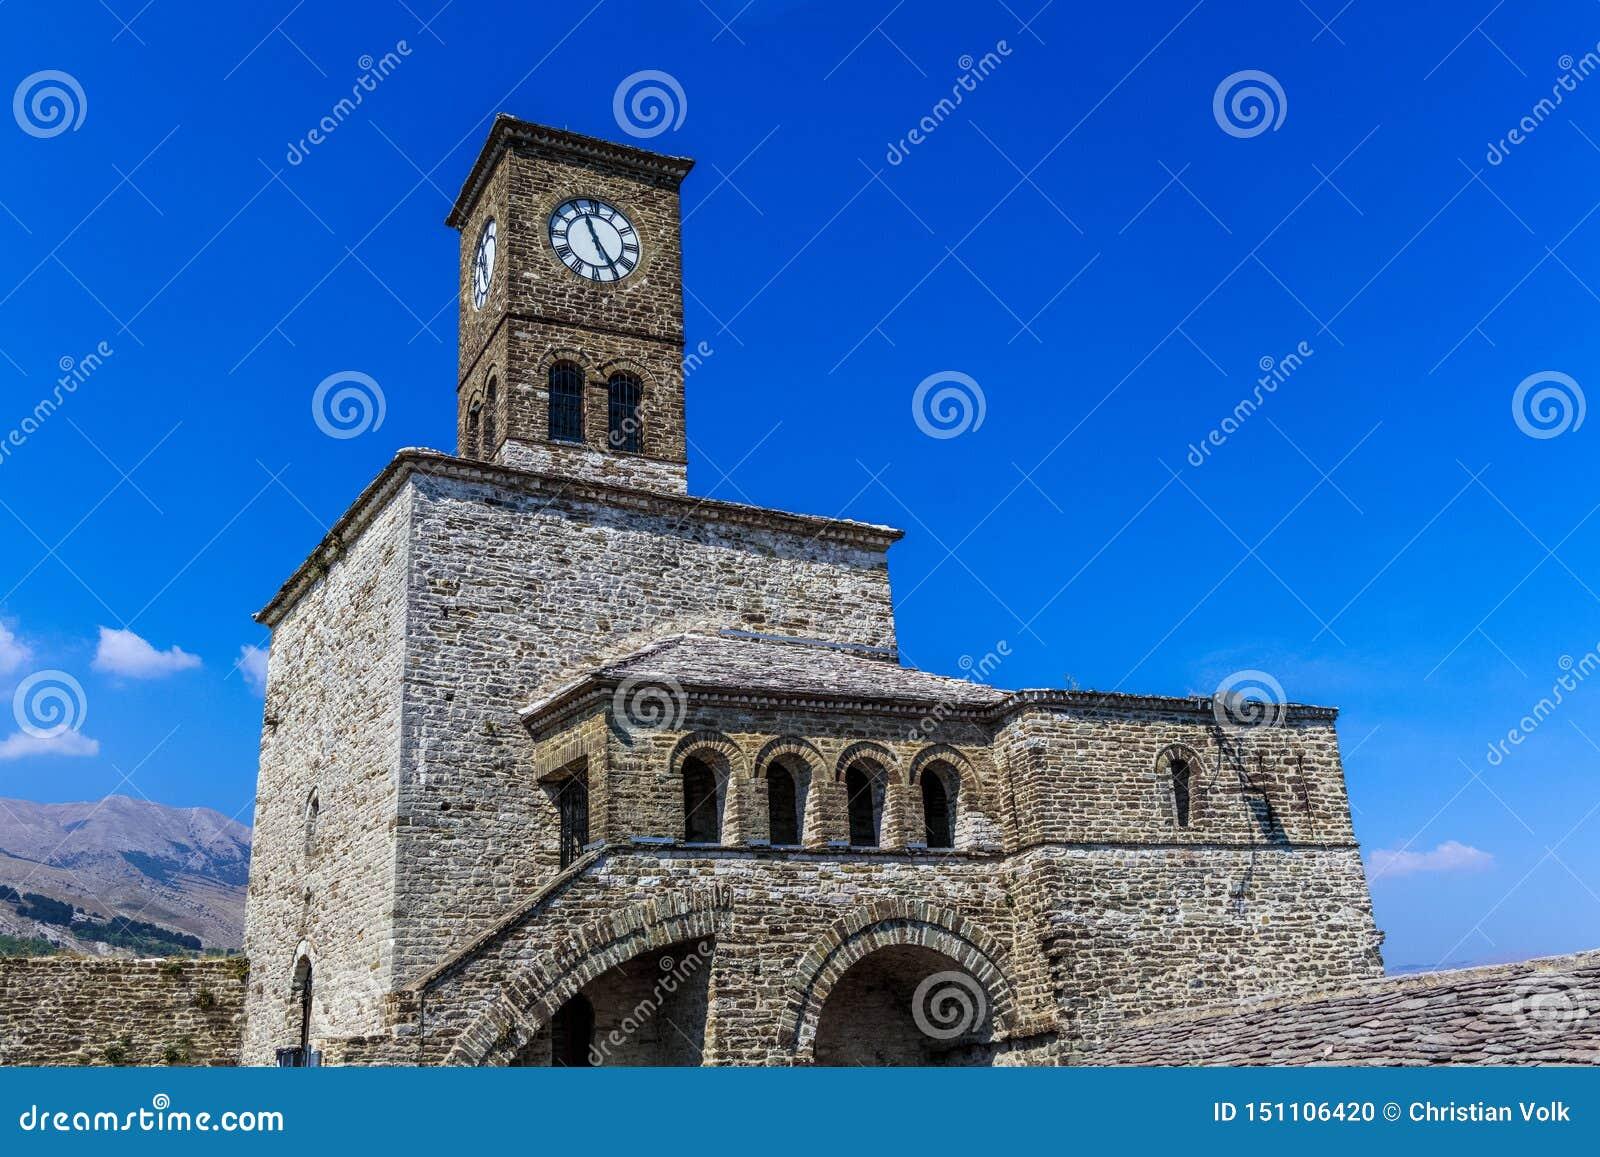 Torre de Bell do castelo de Gjirokastra, Albânia